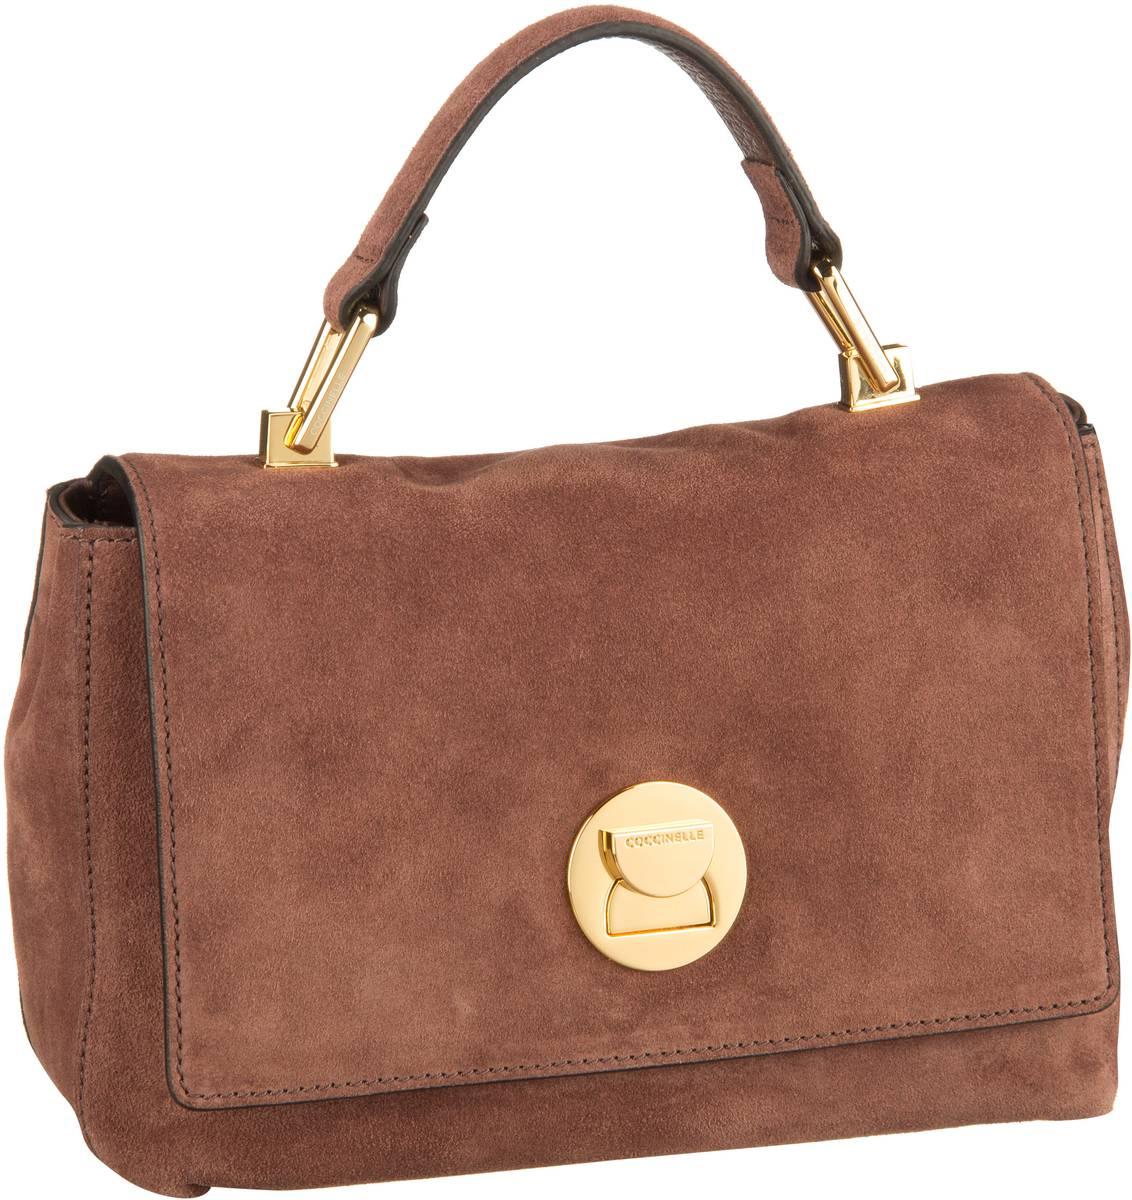 Handtasche Liya Suede 5840 Marron Glacé